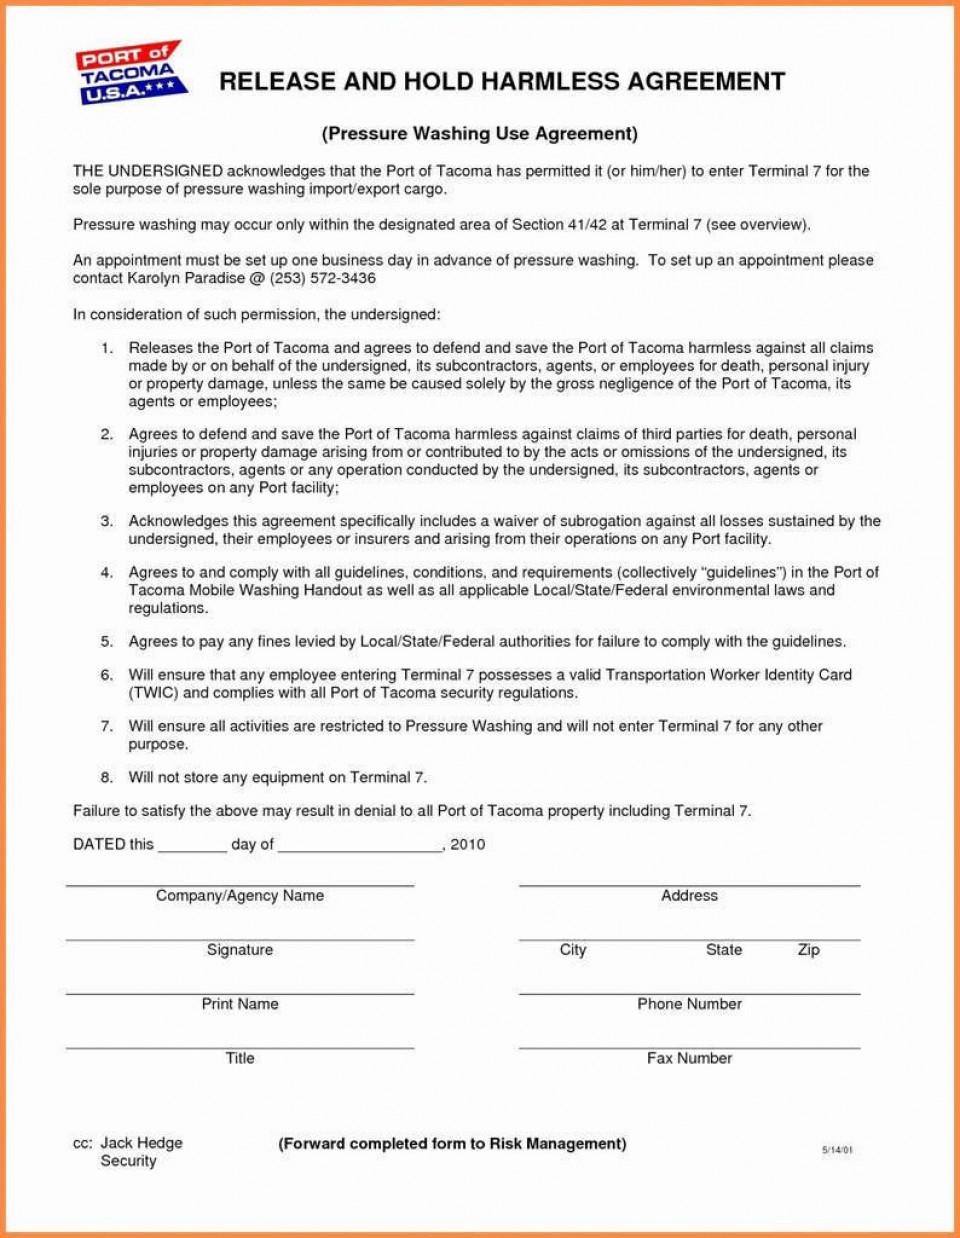 009 Shocking Operation Agreement Llc Template Example  Operating Florida Indiana Single Member California960